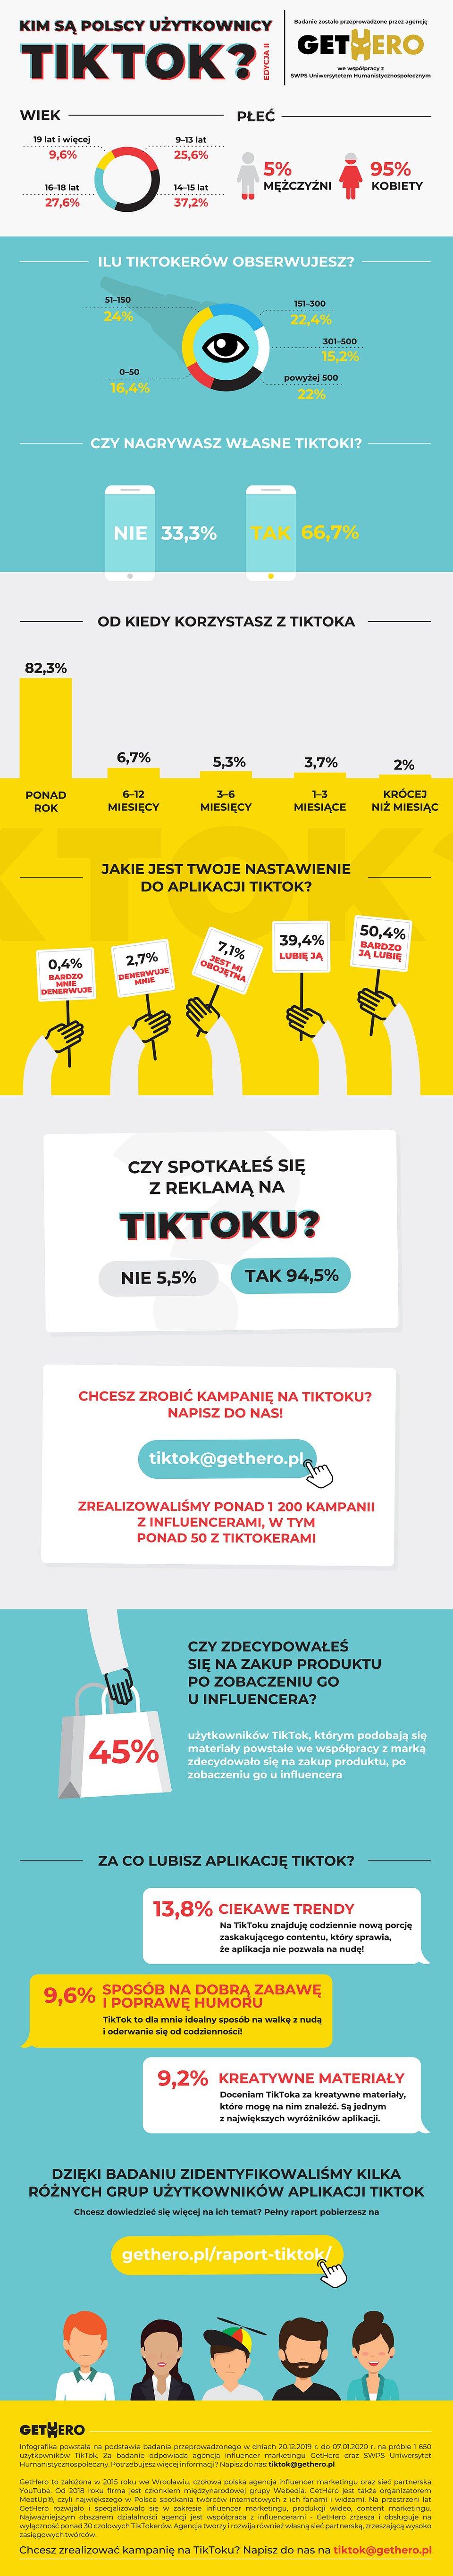 Infografika_TikTok_GetHero.jpg